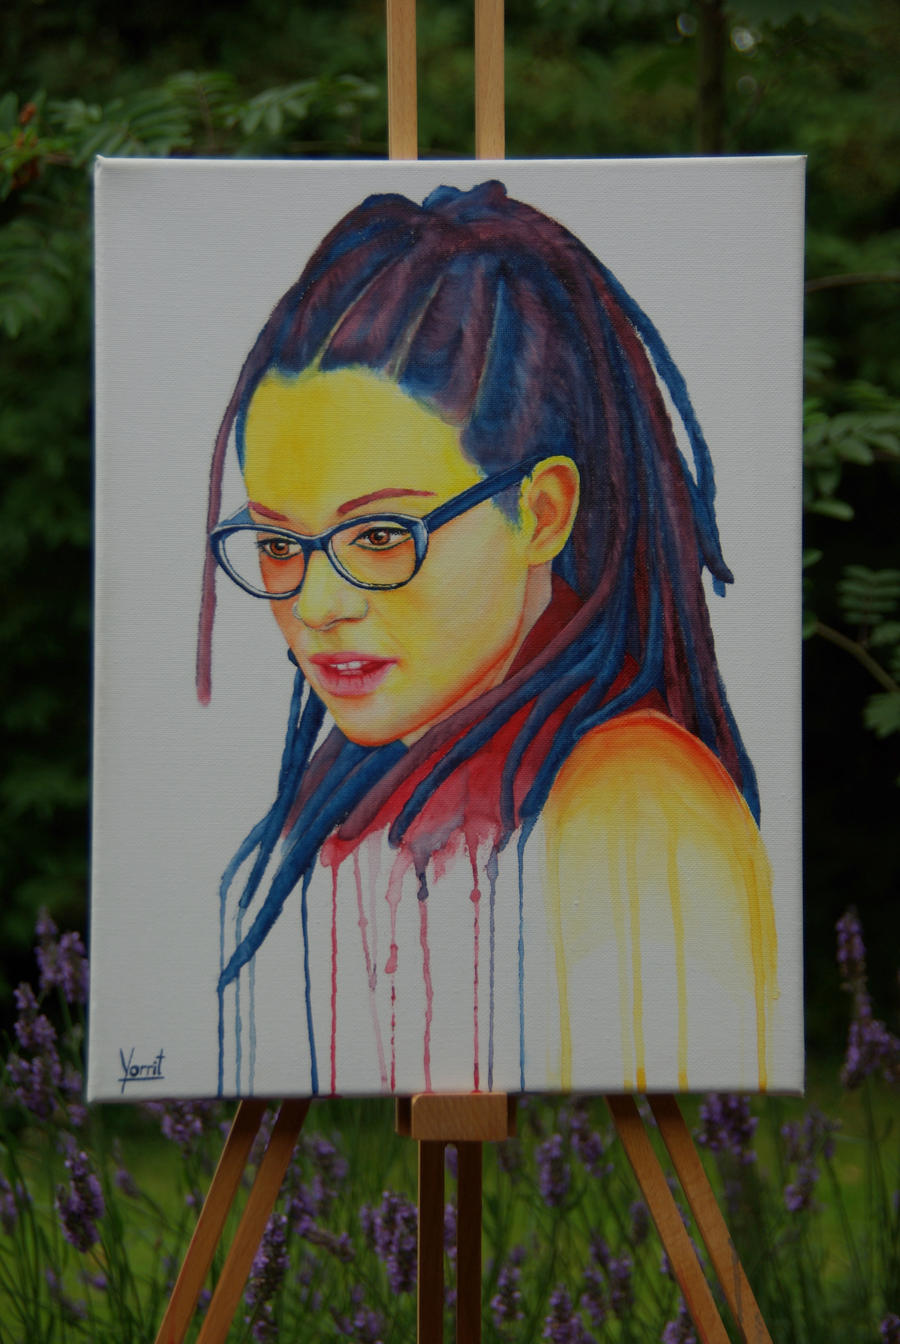 Cosima Niehaus (Orphan Black) watercolour by Yorrit